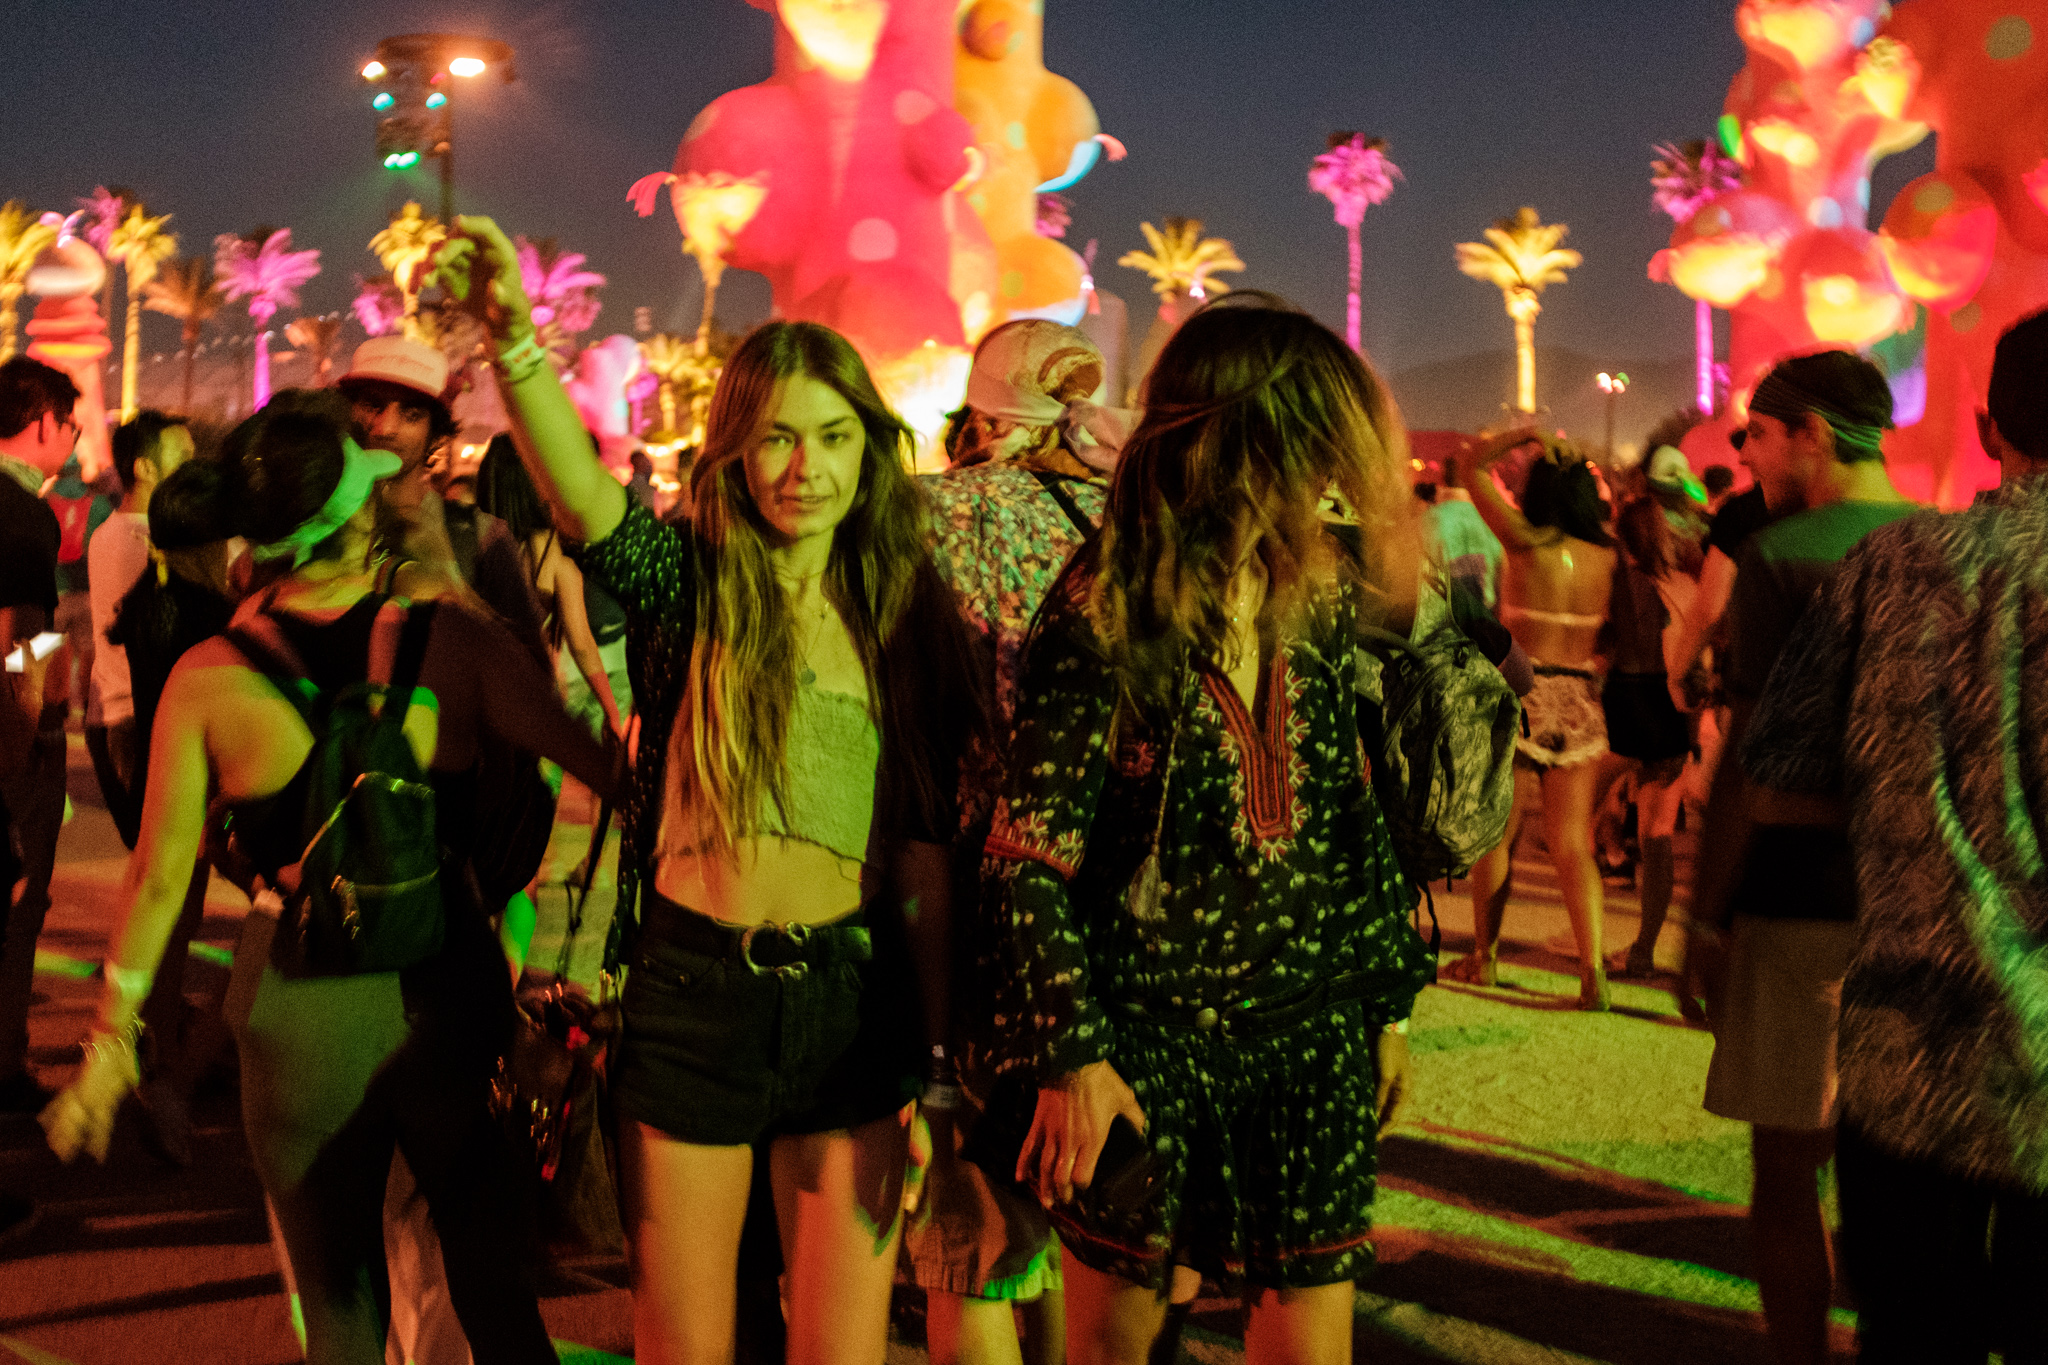 170423 Coachella 17 w2 2137.jpg